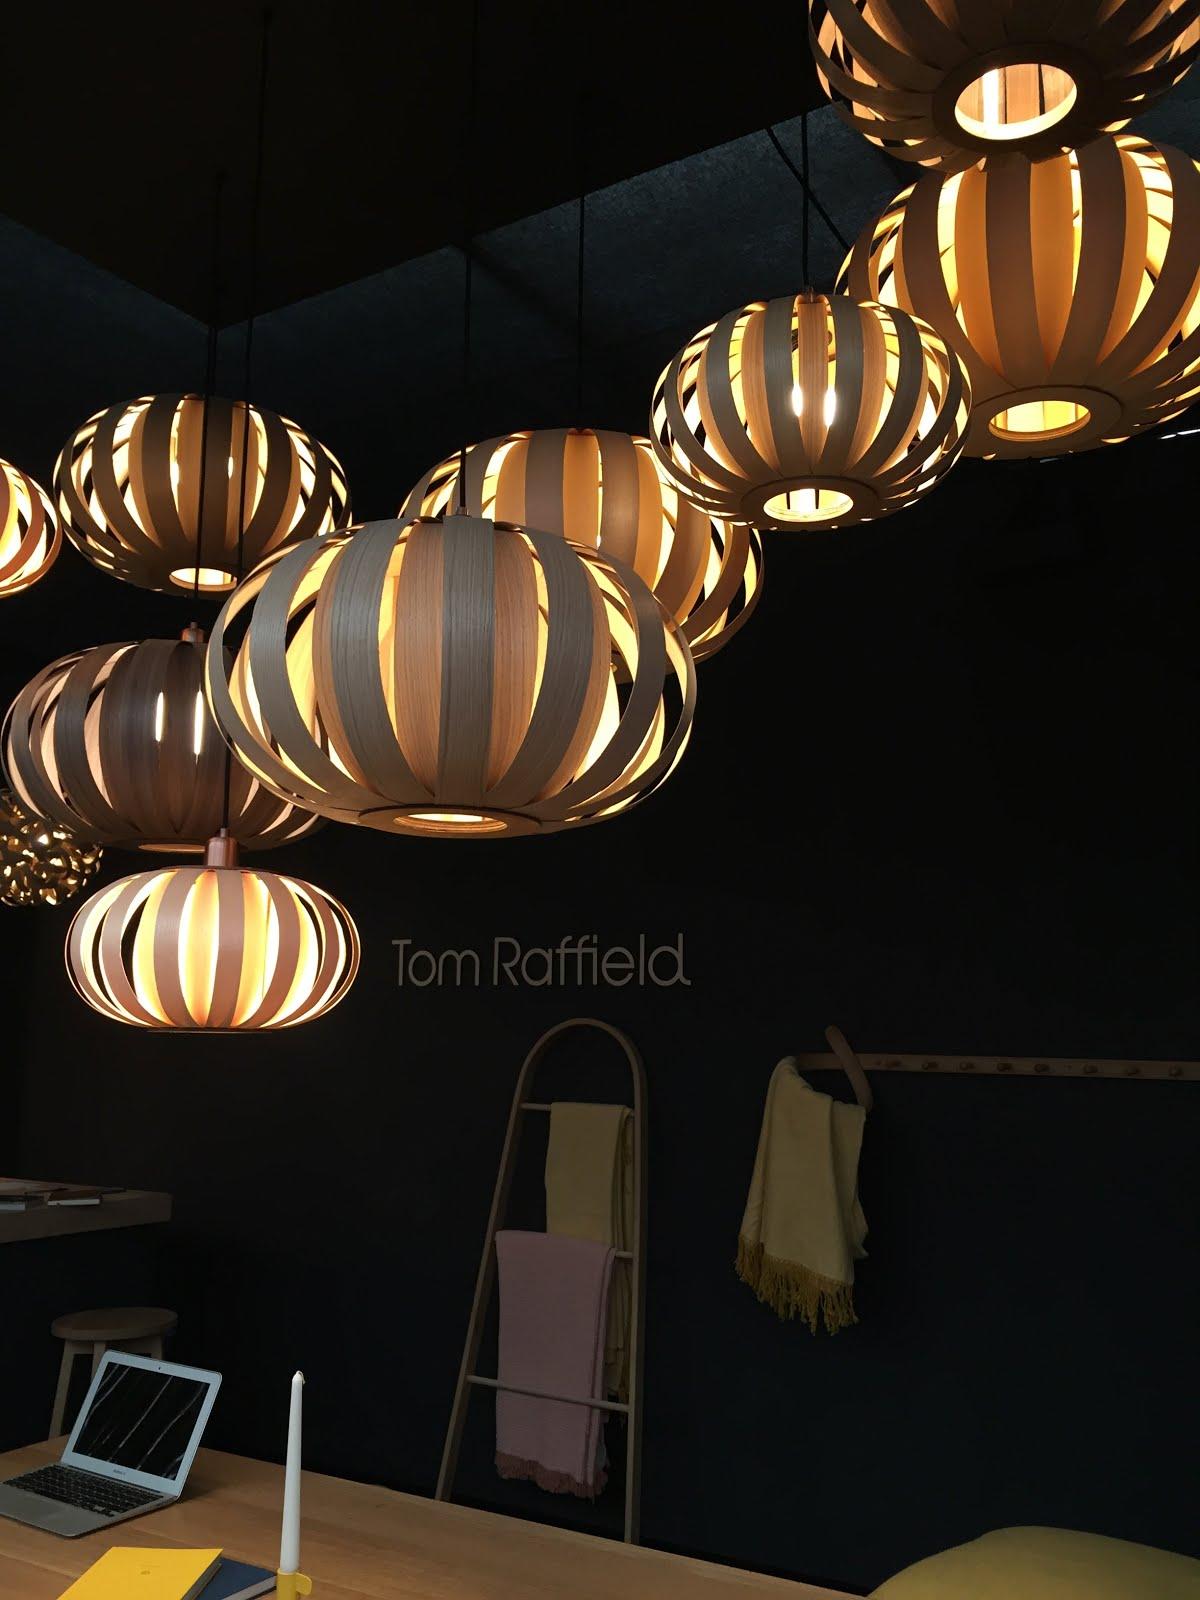 Decorex highlights, LDF, Interior design, interiors trends, hello peagreen, Tom Raffield